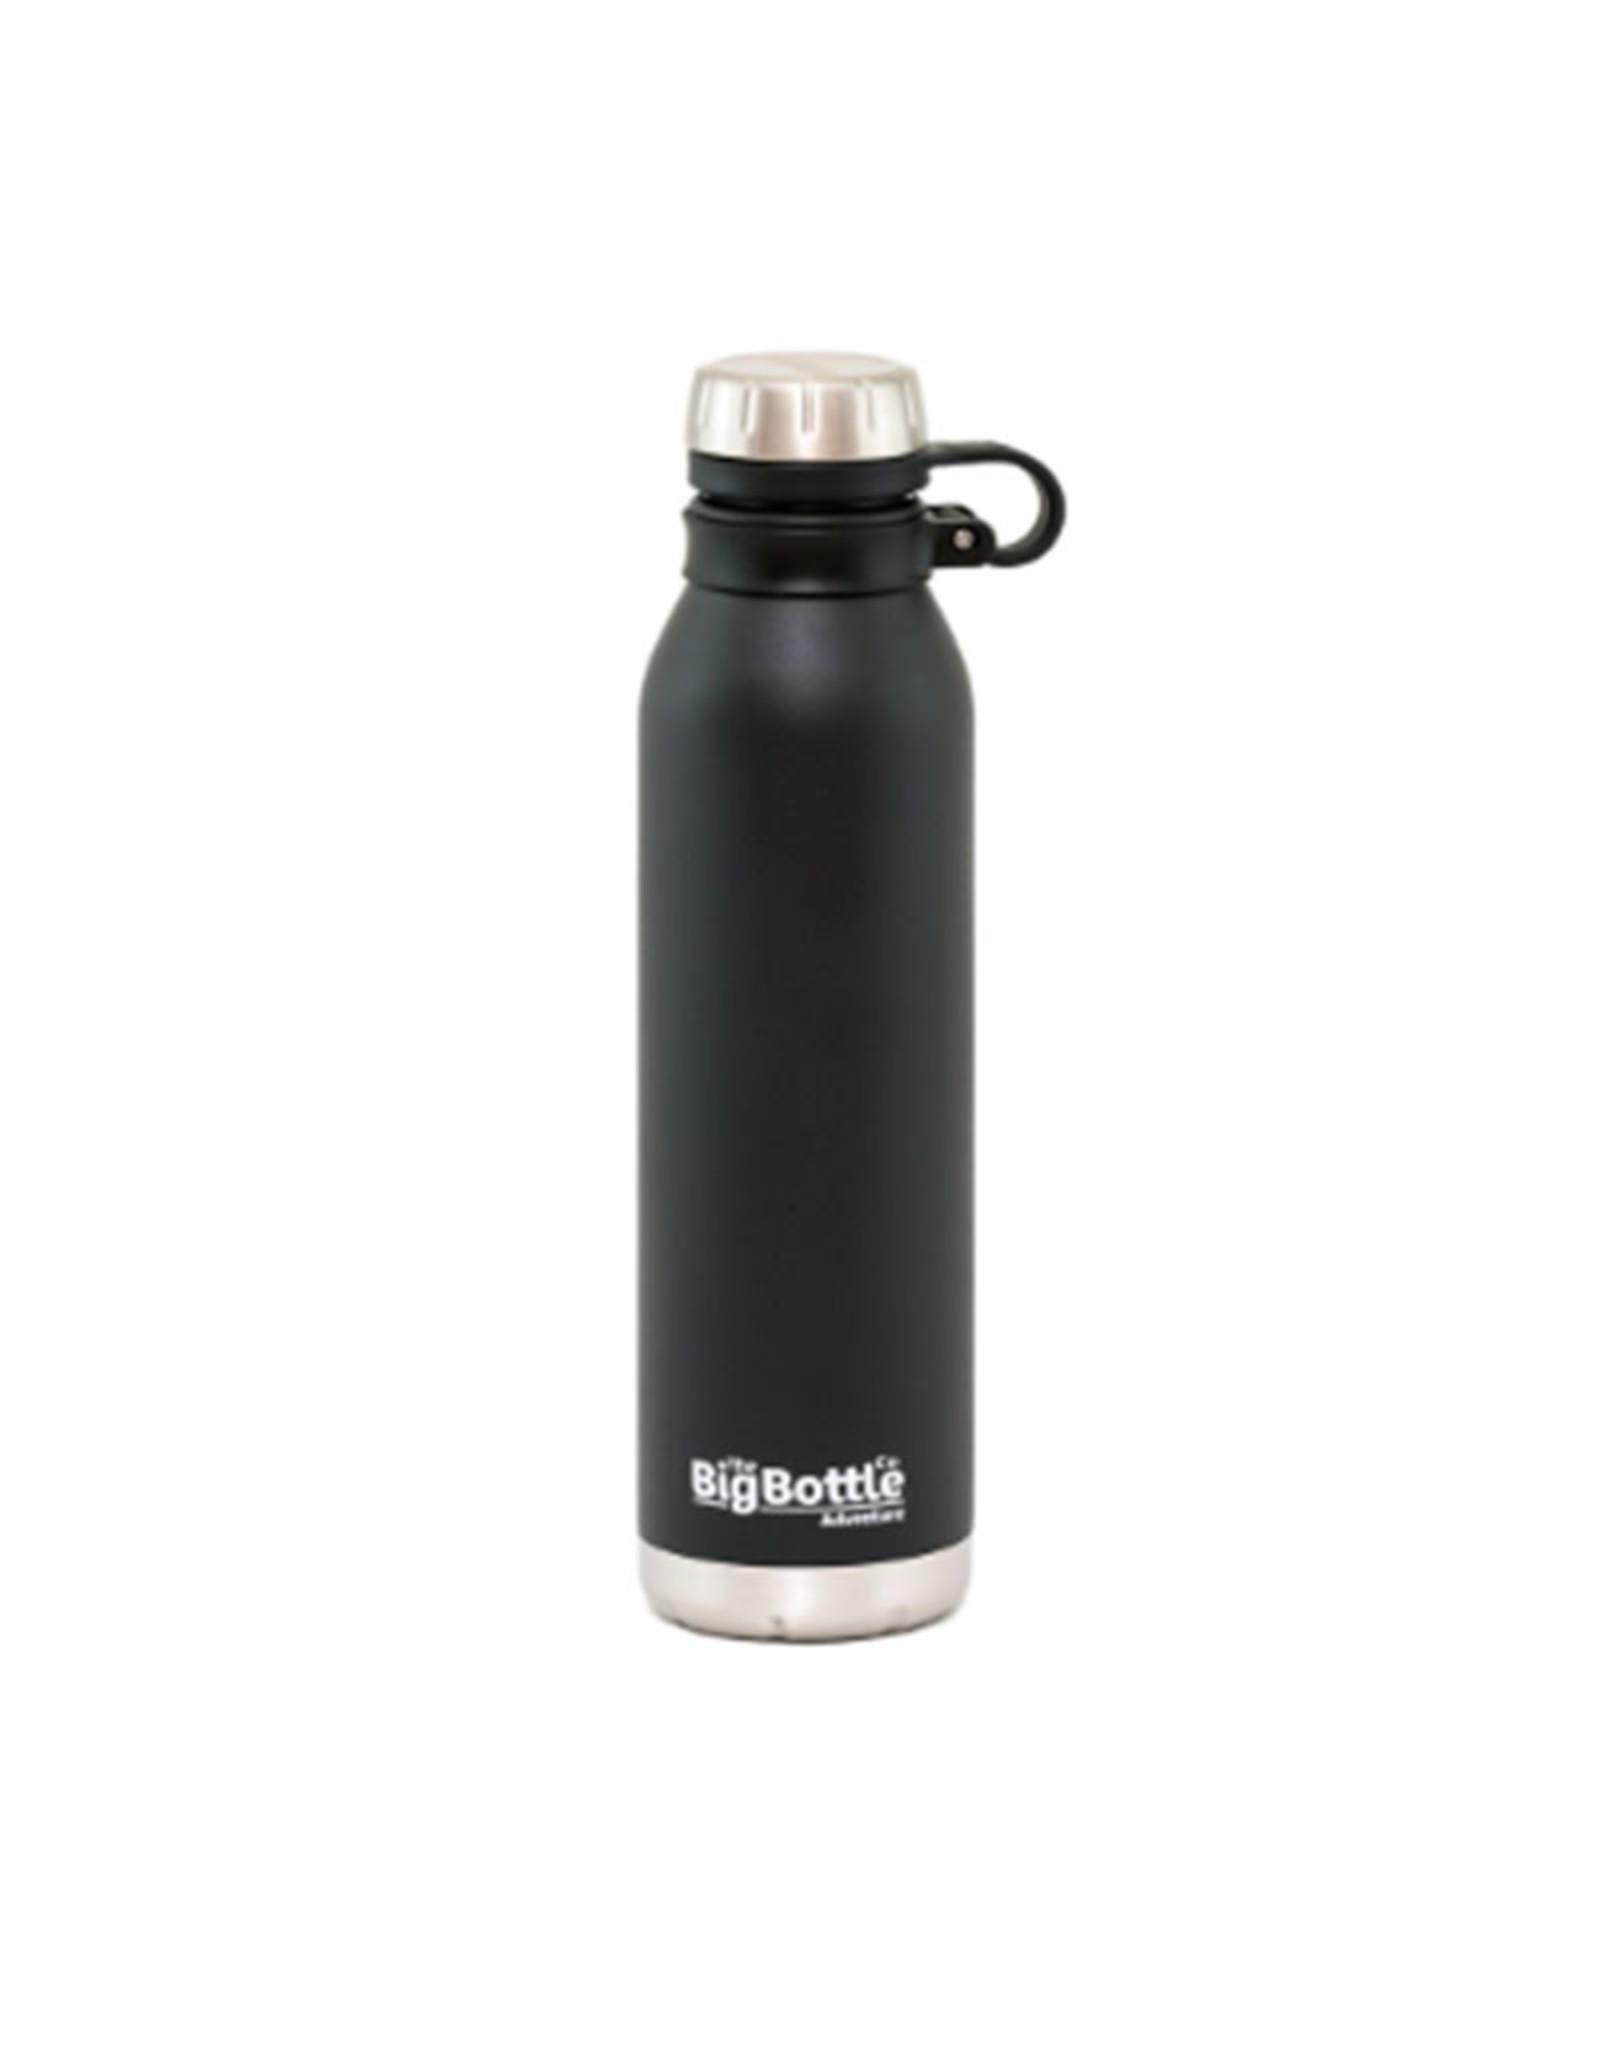 Big Bottle Co. Big Bottle Co. - Adventure Range, Jet Black Adventure (750ml)